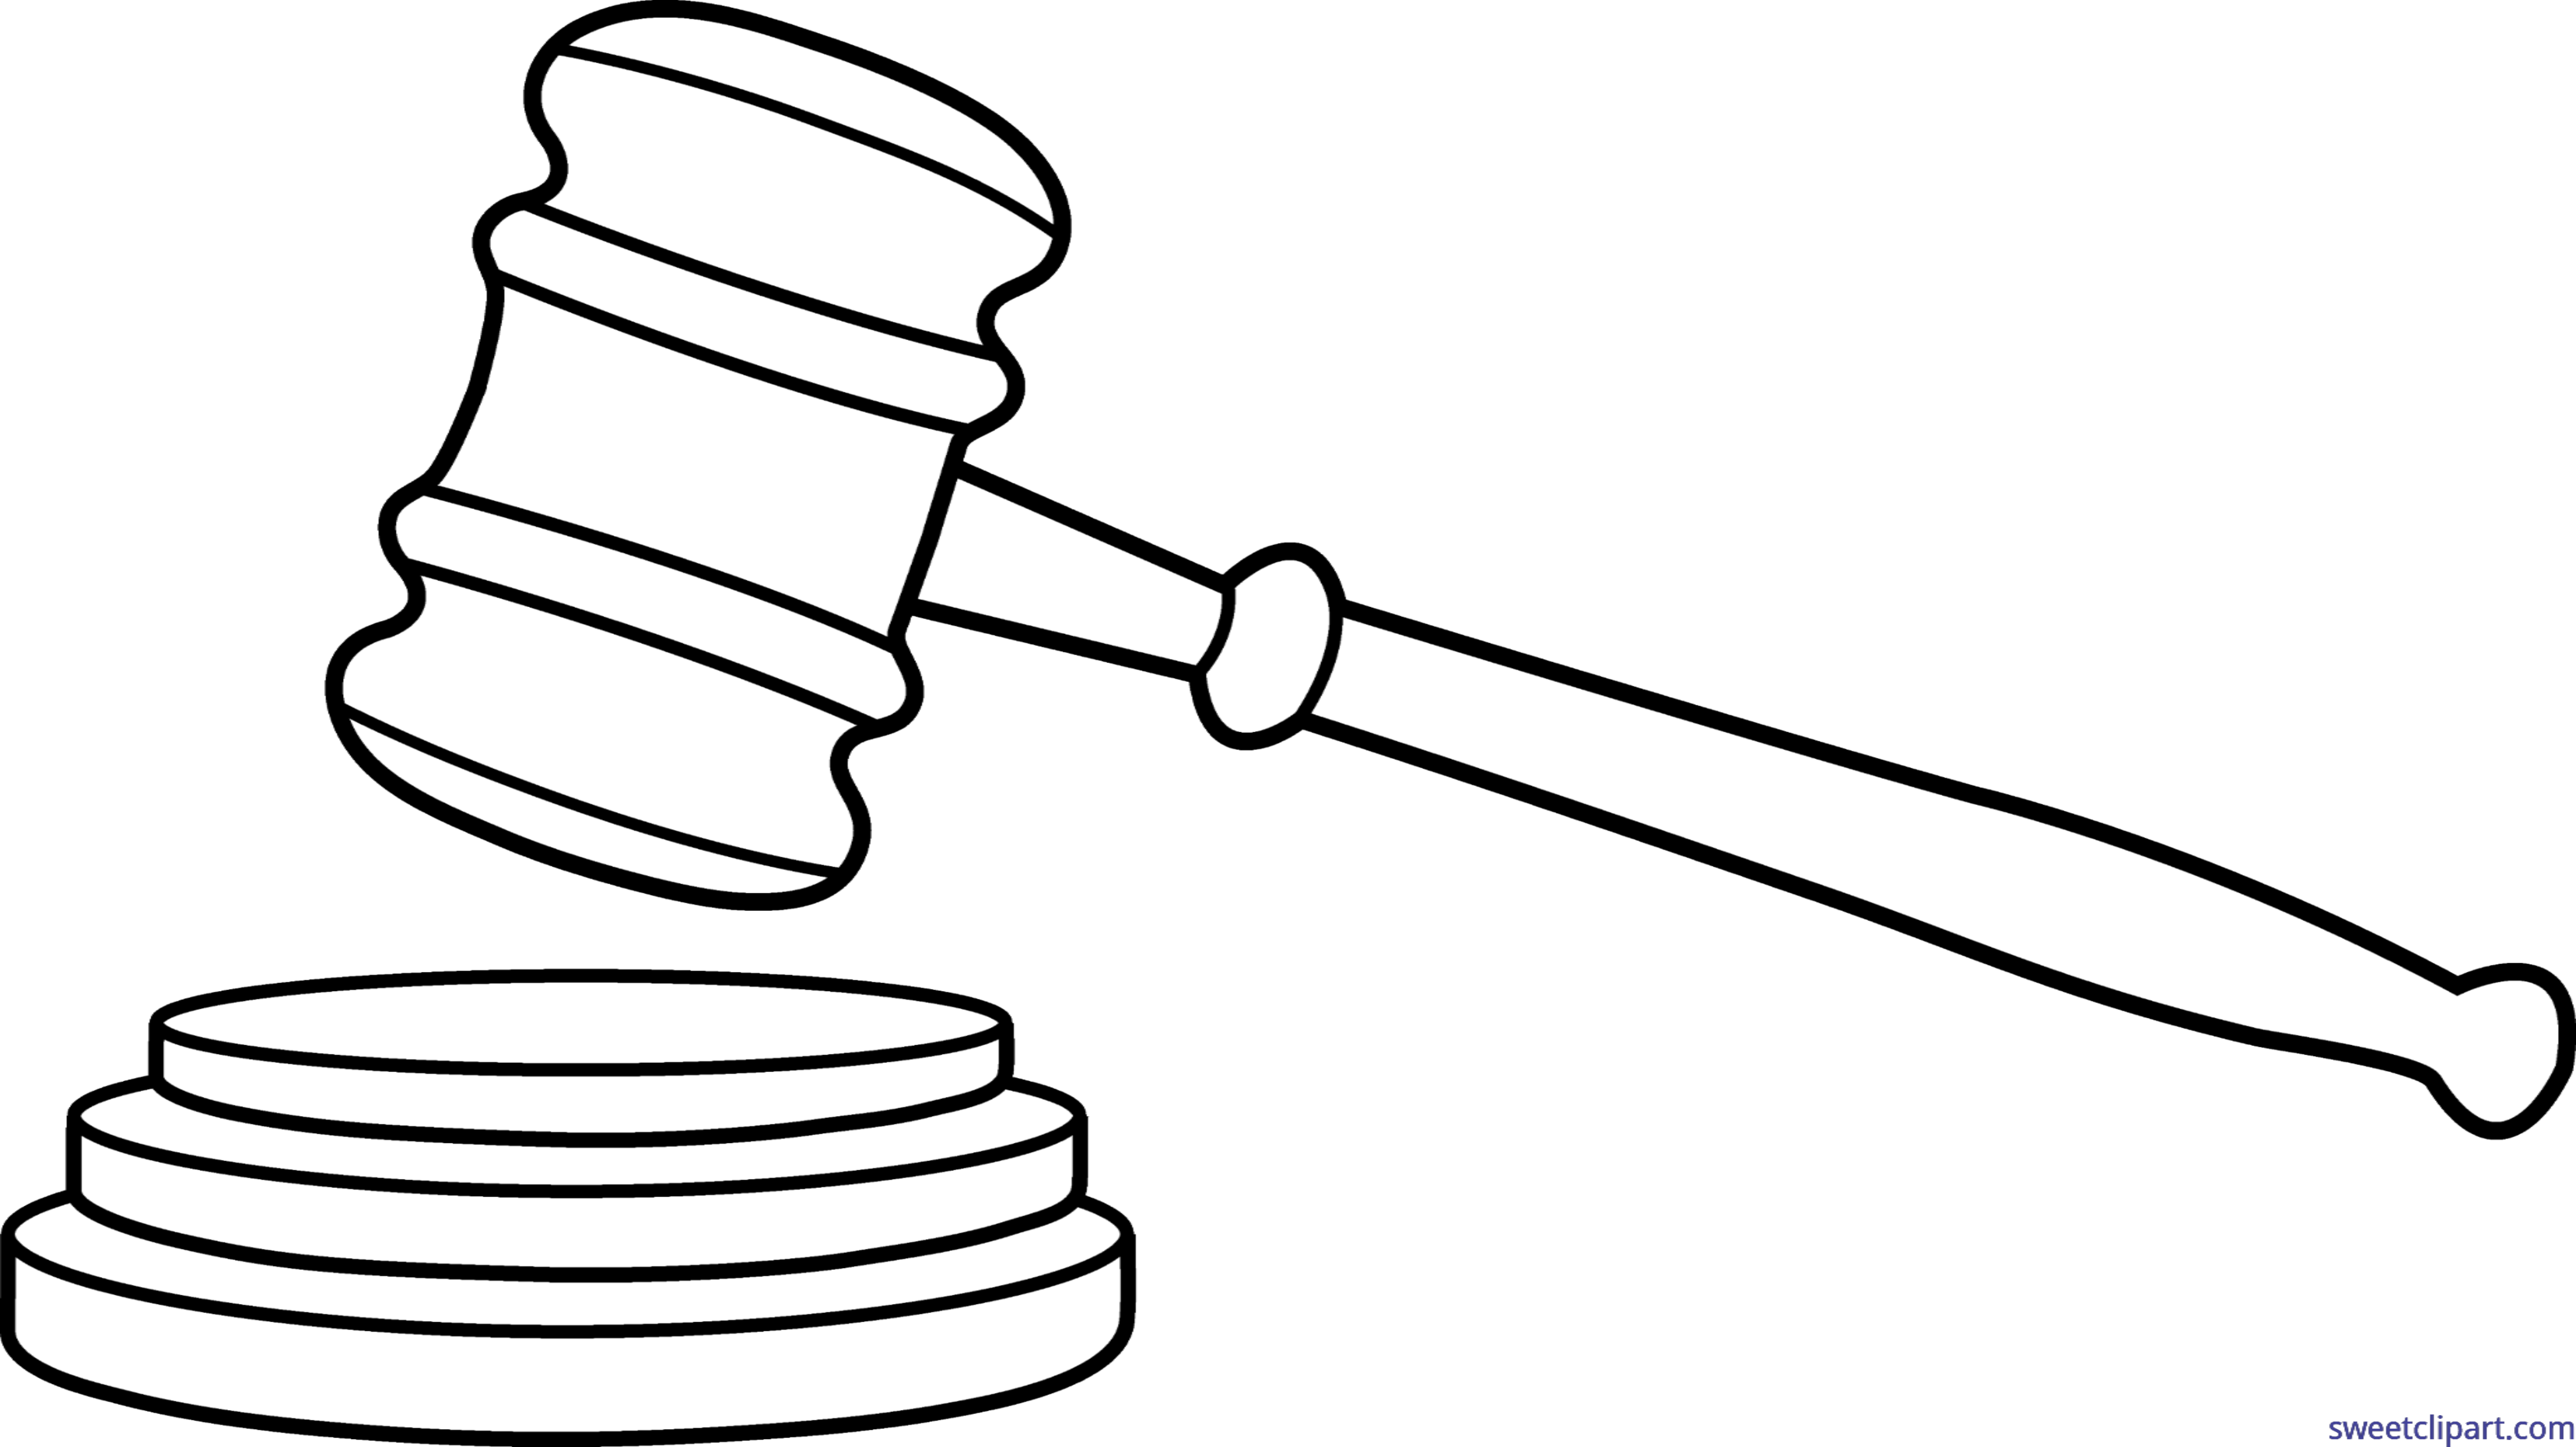 Jury lawyer